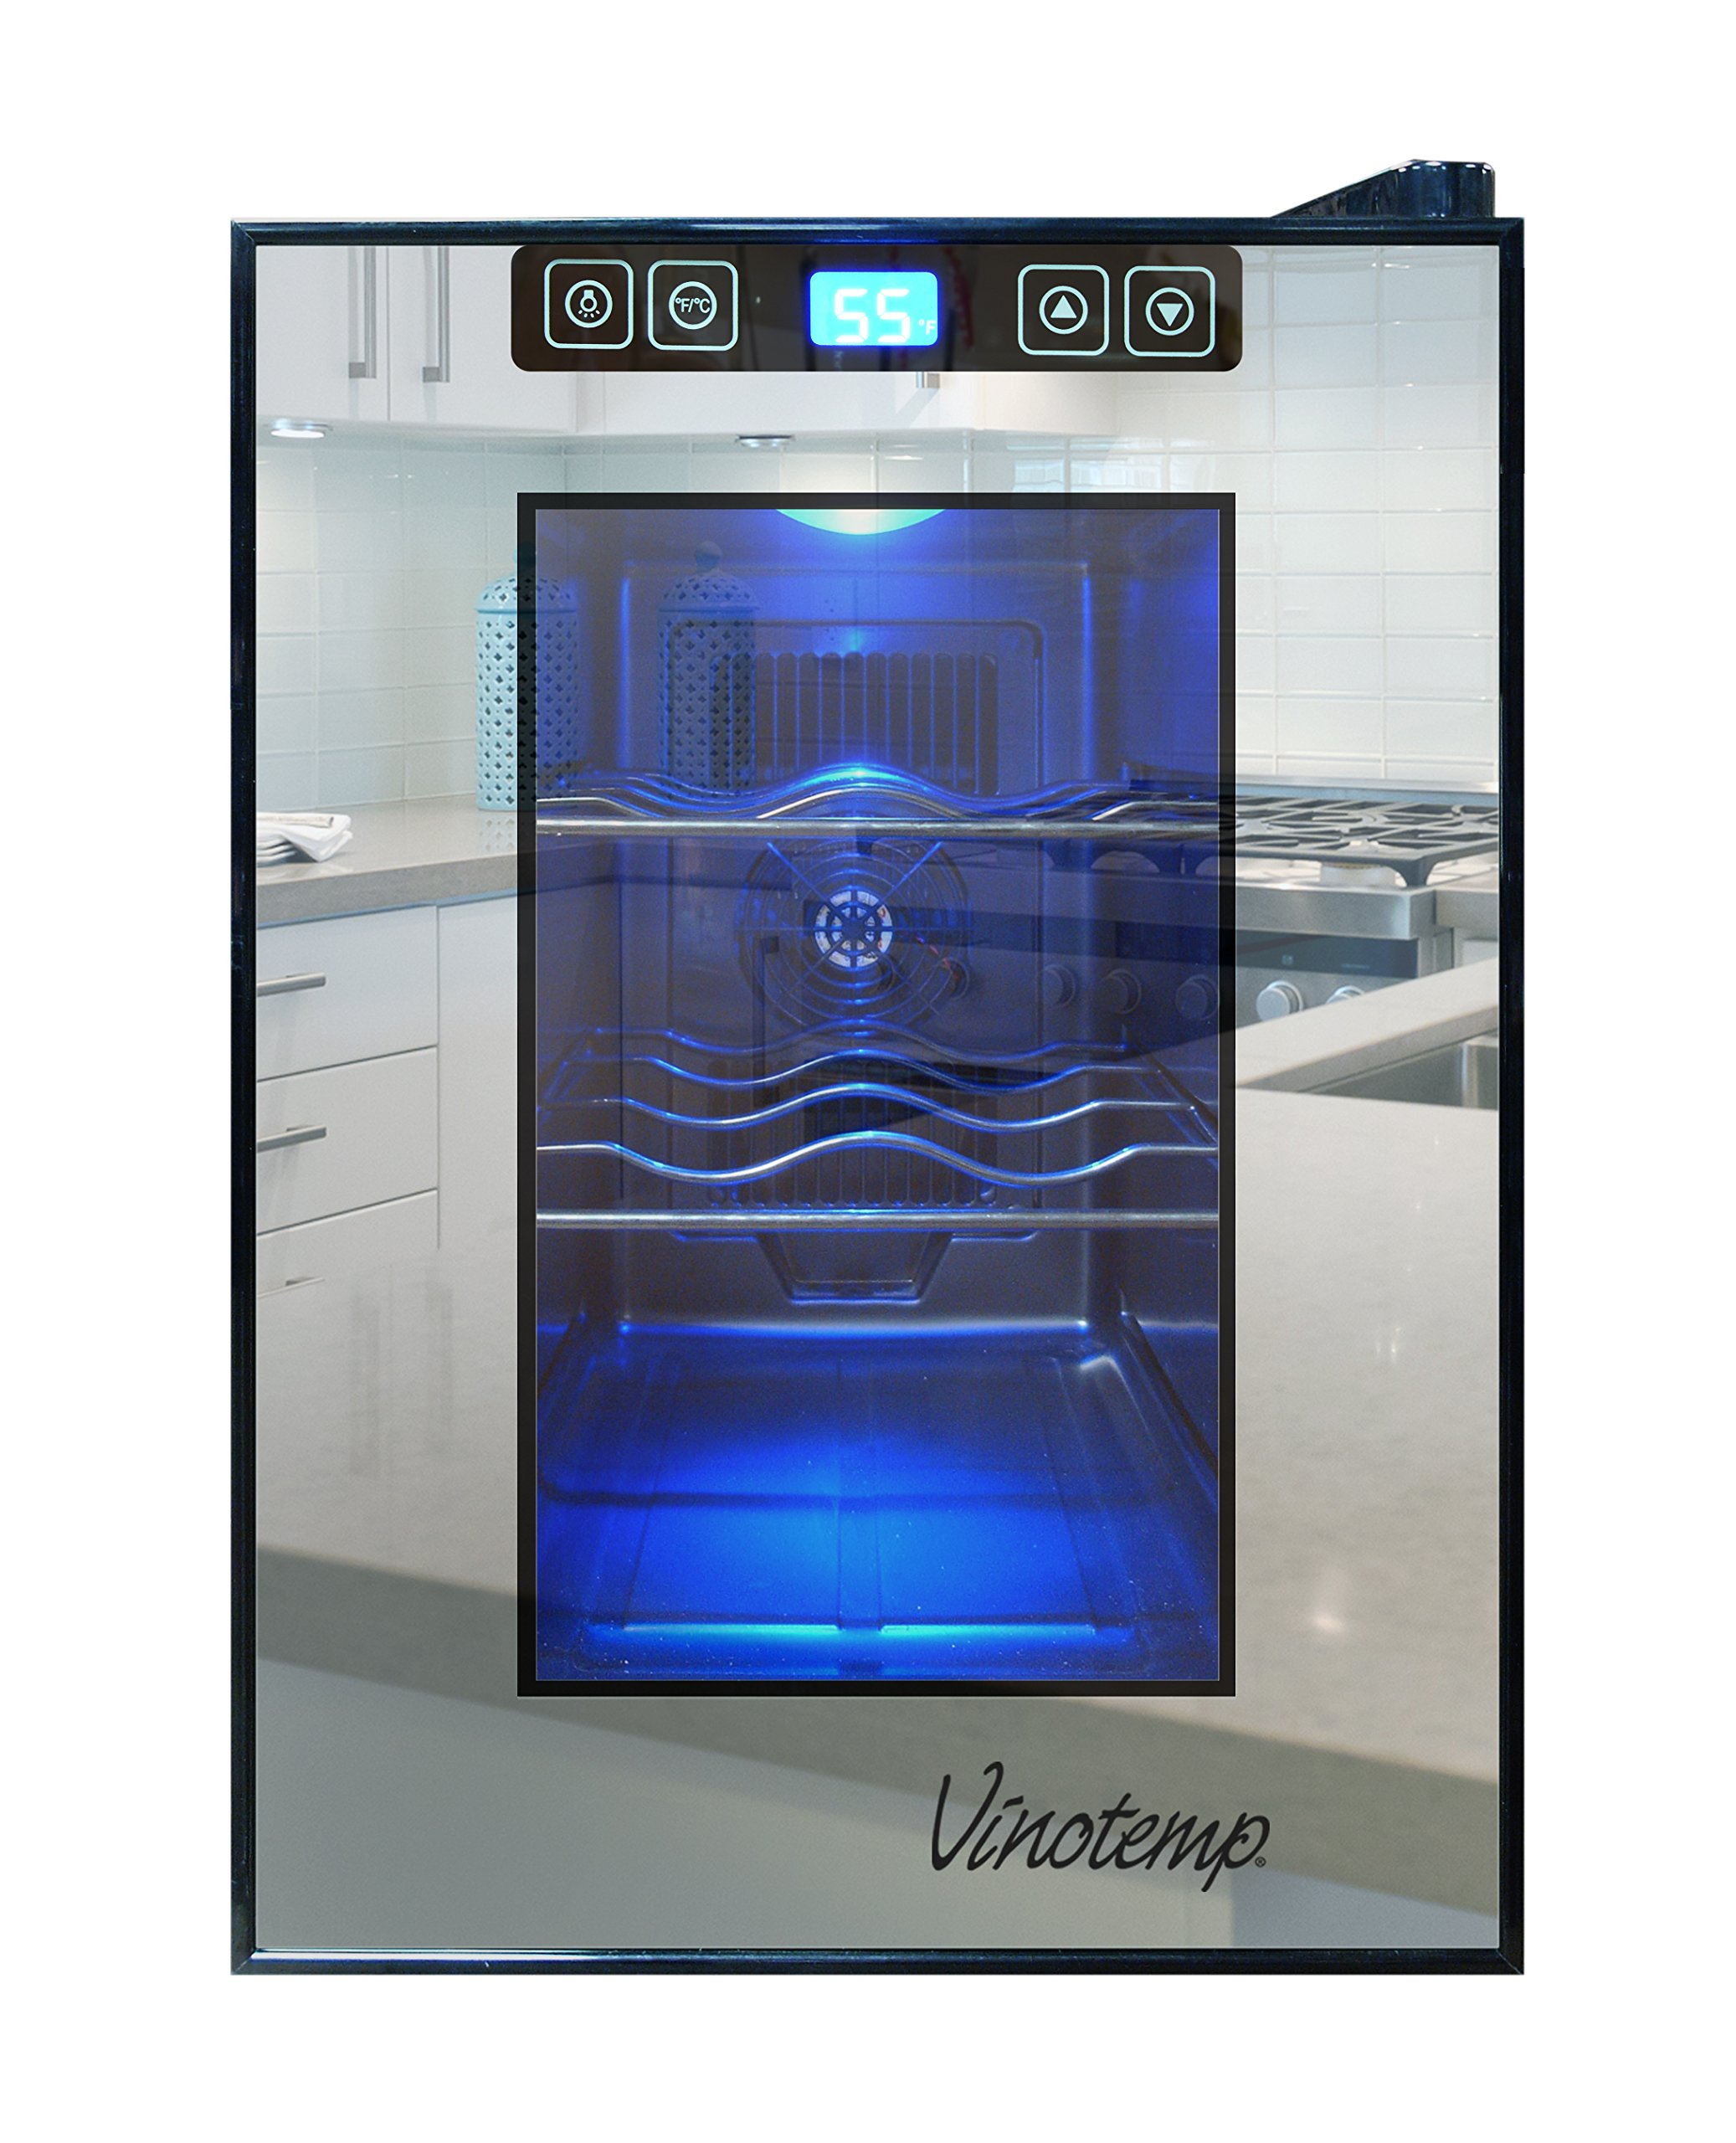 Vinotemp VT-6TSBM 6-Bottle Mirrored Thermoelectric Wine Cooler, Black